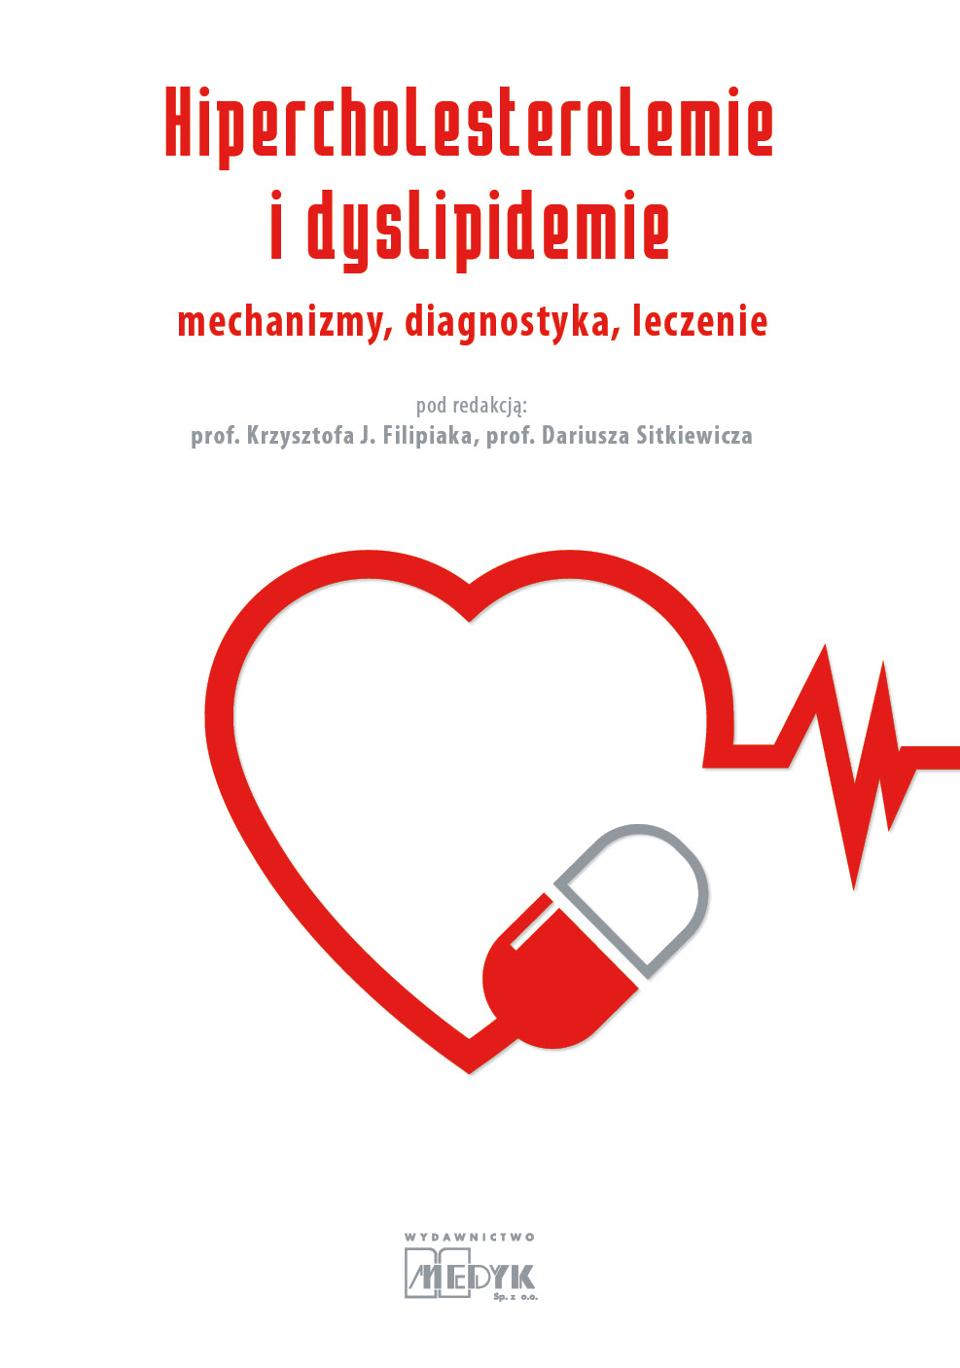 Hipercholesterolemie i dyslipidemie